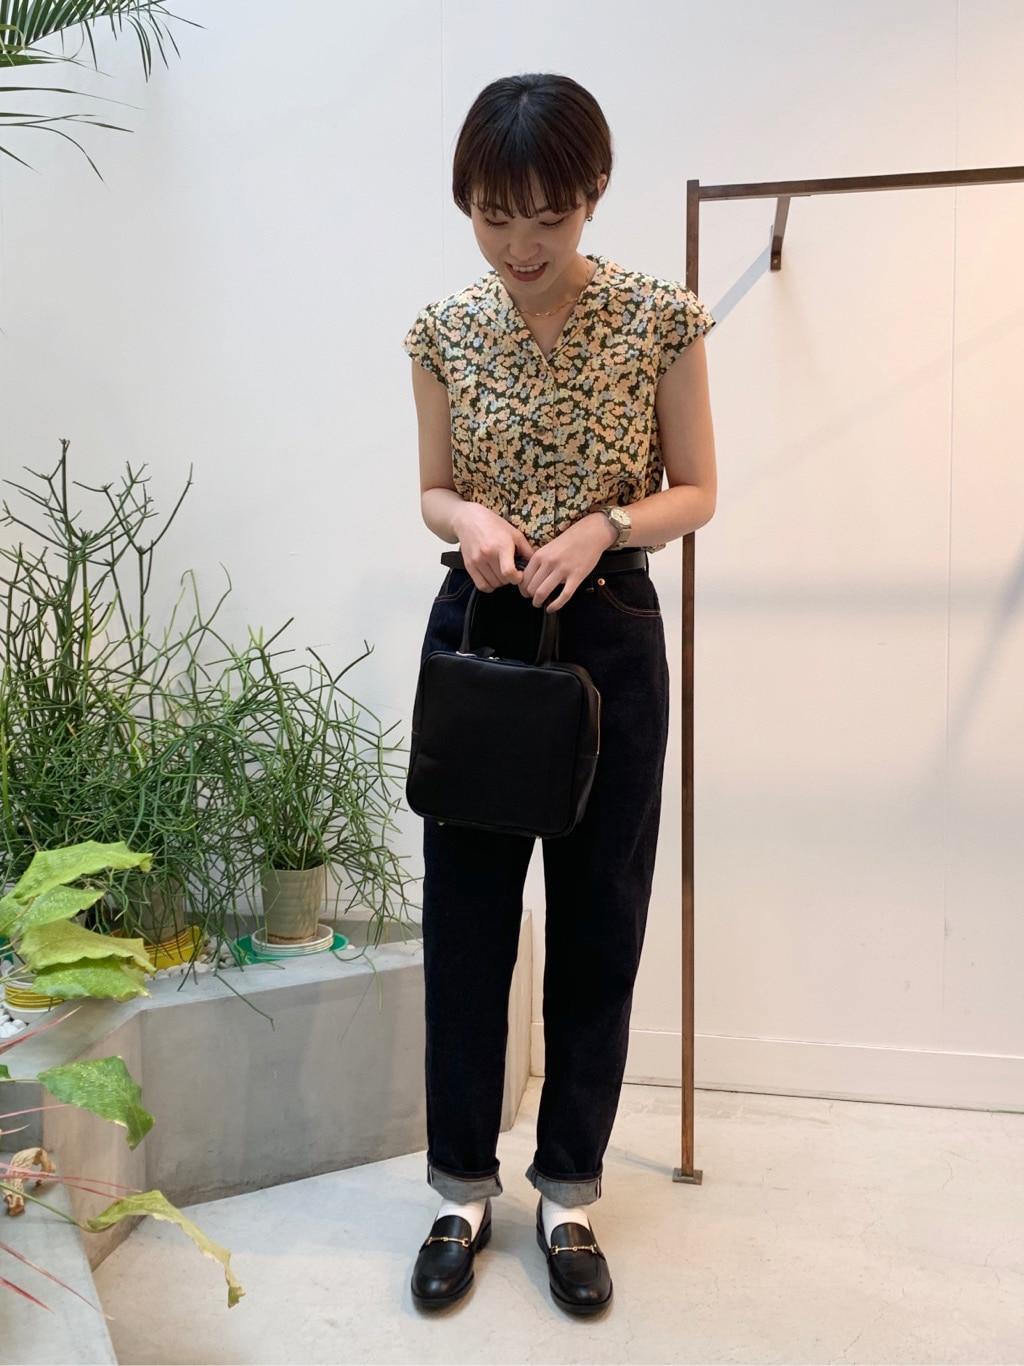 l'atelier du savon 名古屋栄路面 身長:161cm 2020.04.20